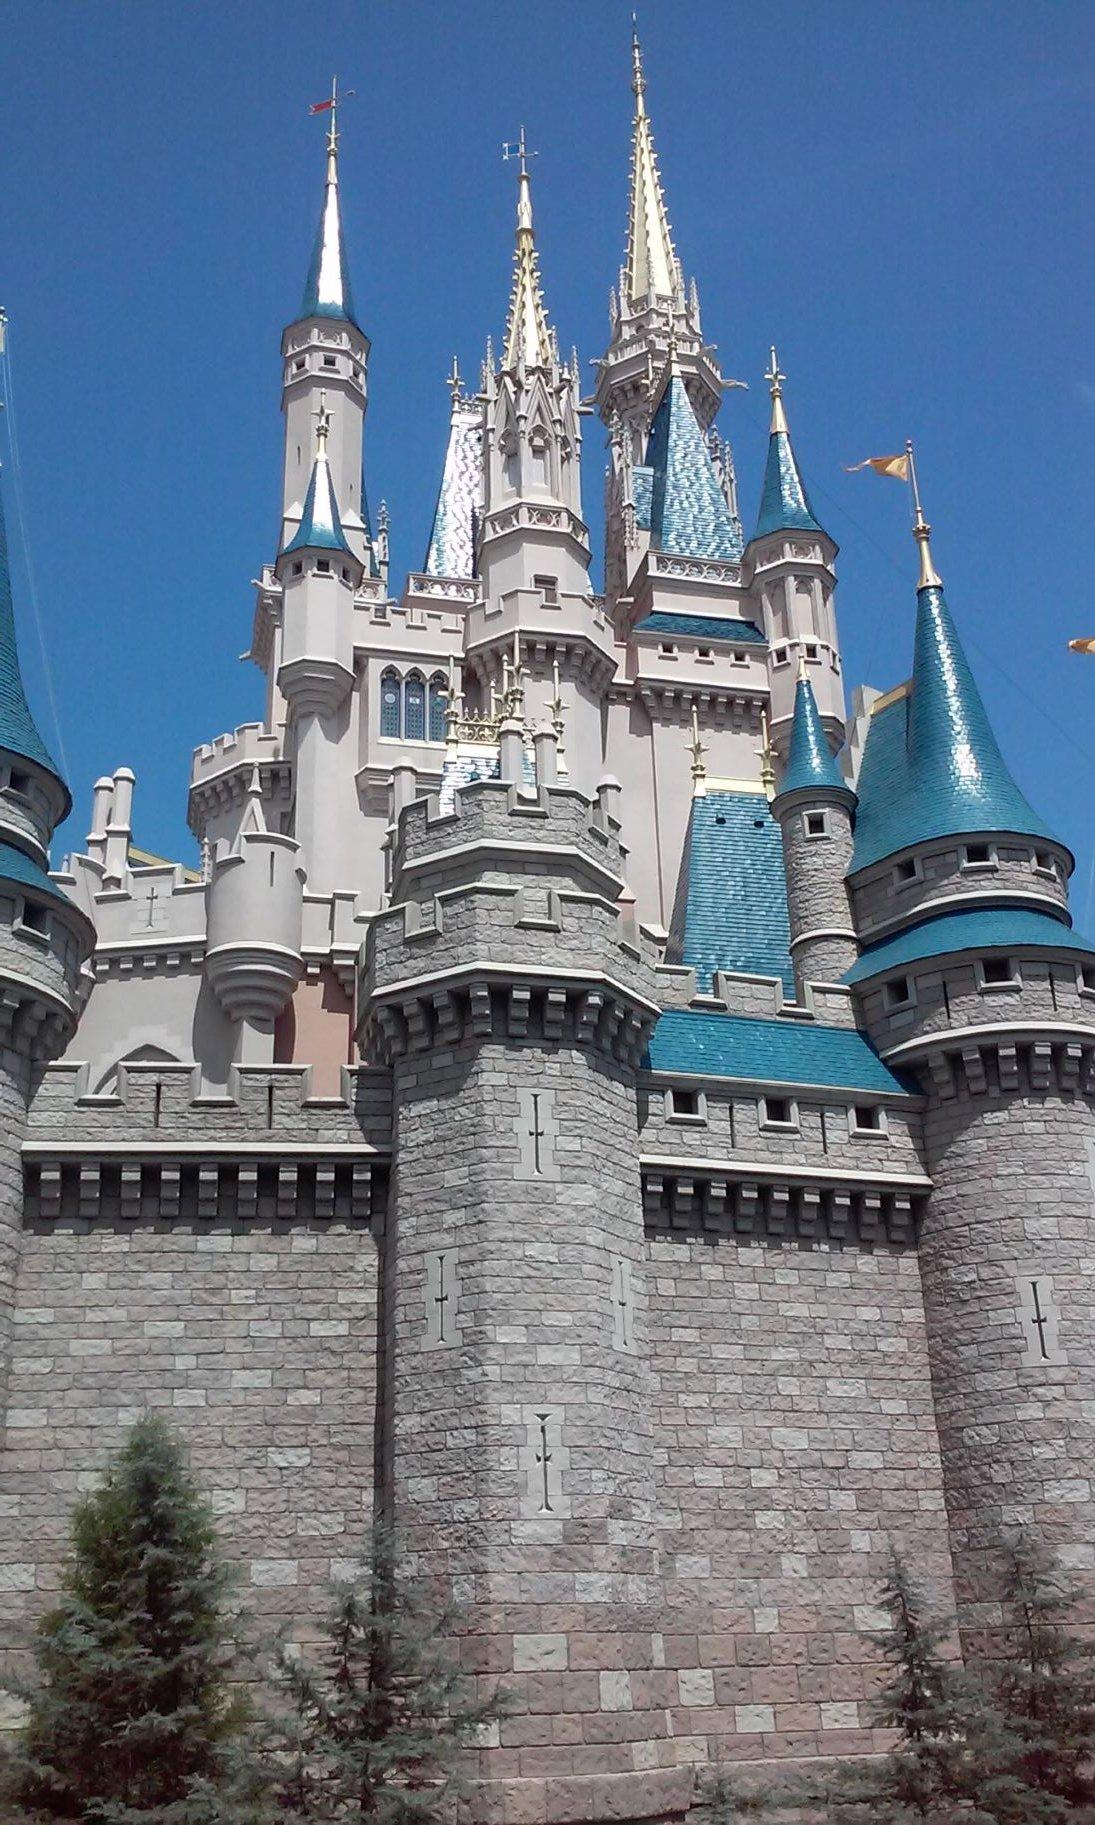 "Cinderella's Castle in the Magic Kingdom park.  McClintic, Tori. ""Cinderella's Castle."" 2018. JPG."